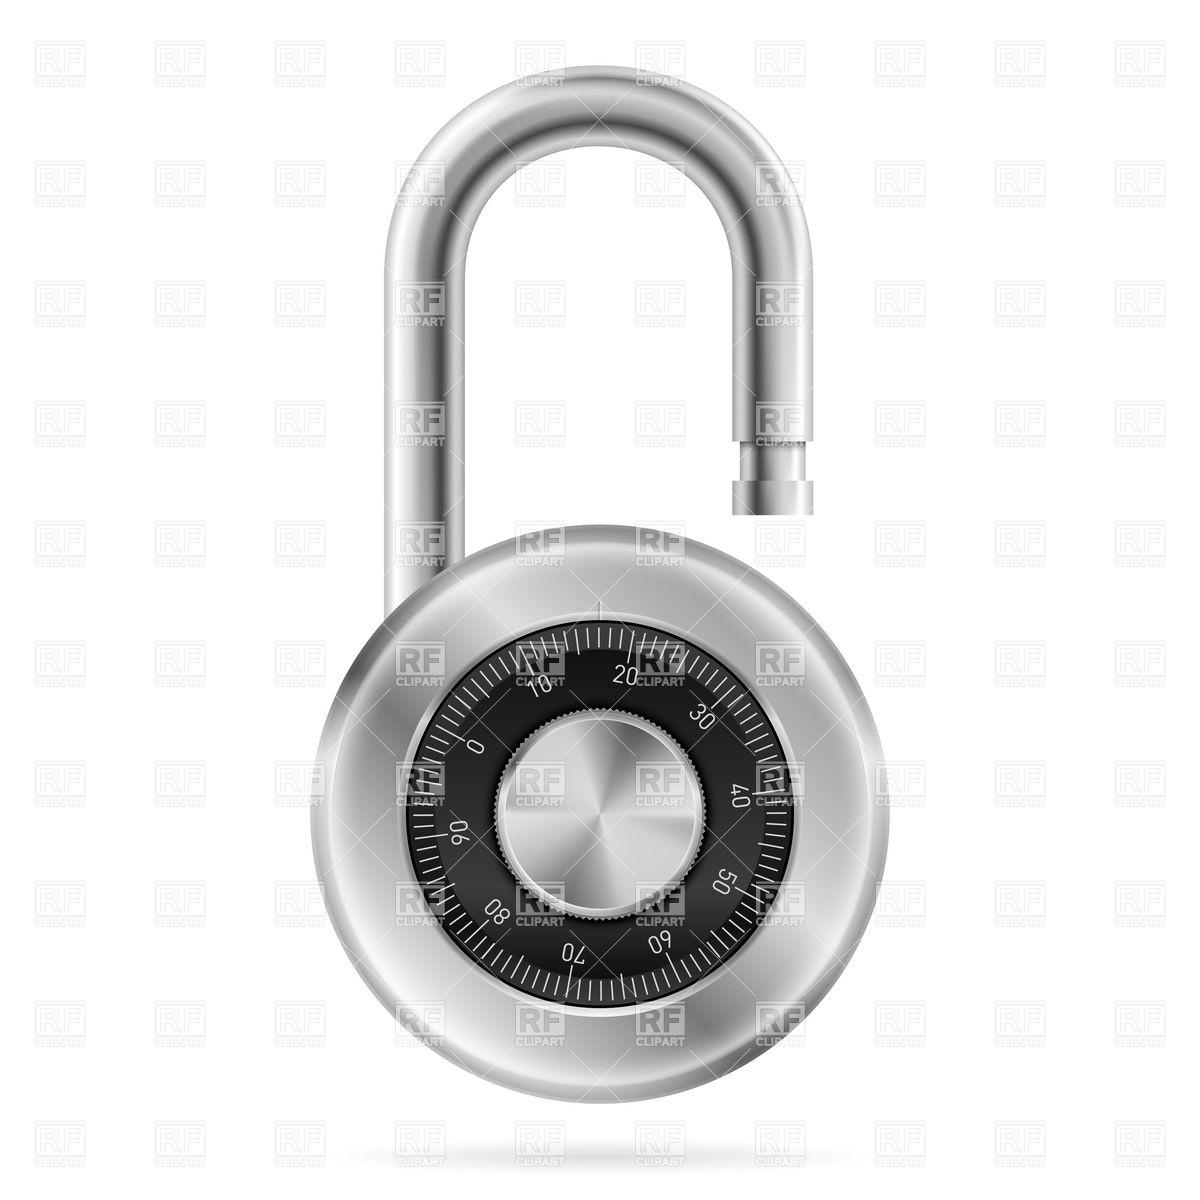 1200x1200 Unlocked Combination Lock Vector Image Vector Artwork Of Objects